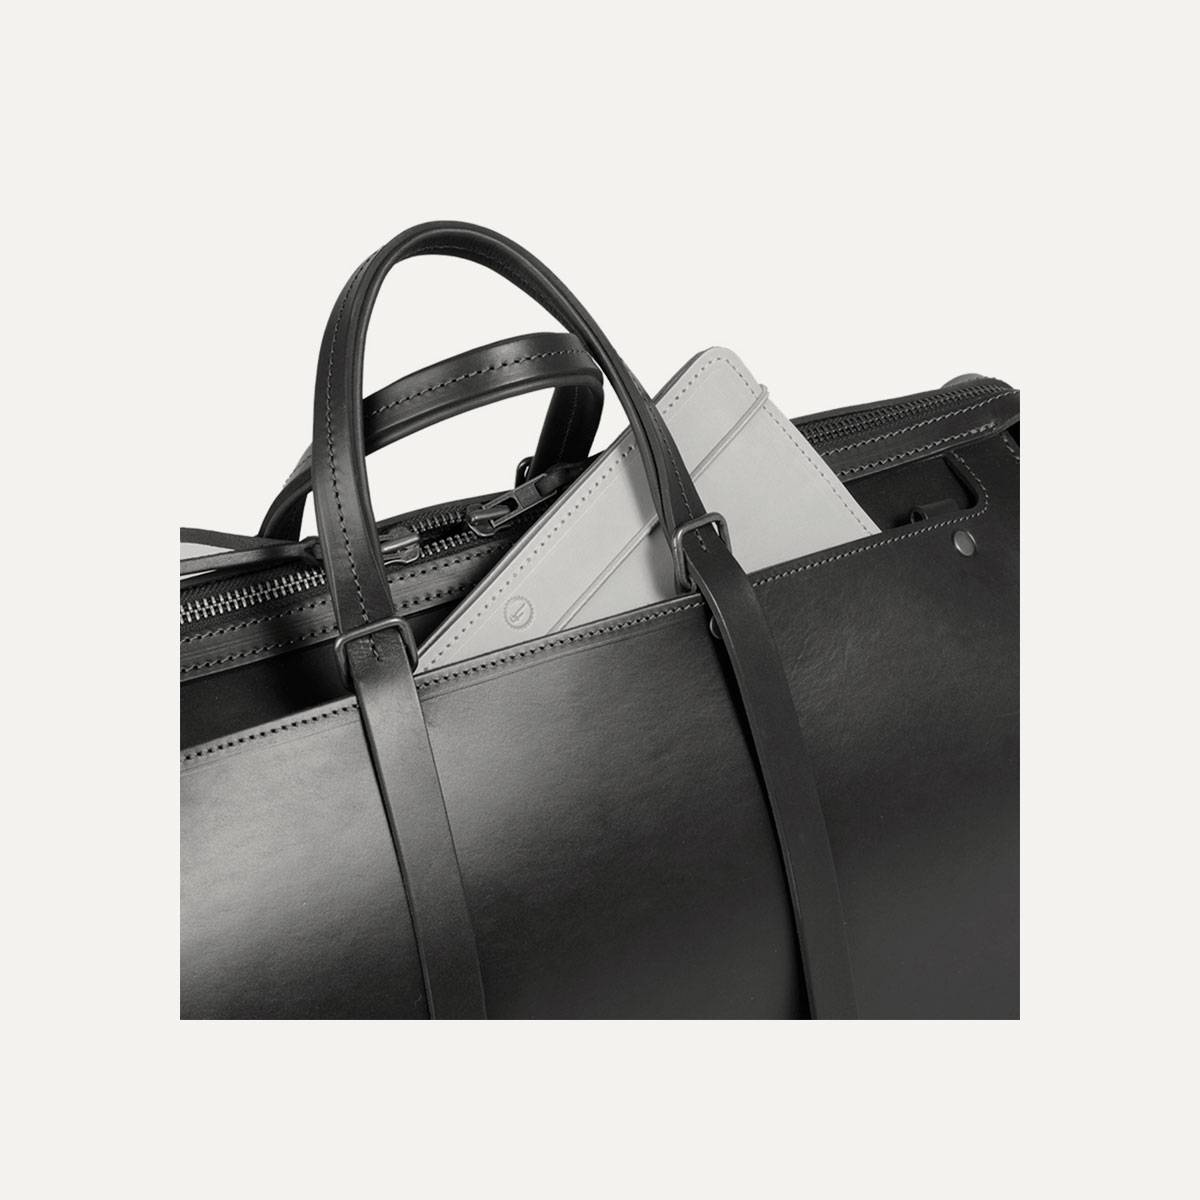 sac de voyage en cuir homme i fabriqu en france bleu de. Black Bedroom Furniture Sets. Home Design Ideas